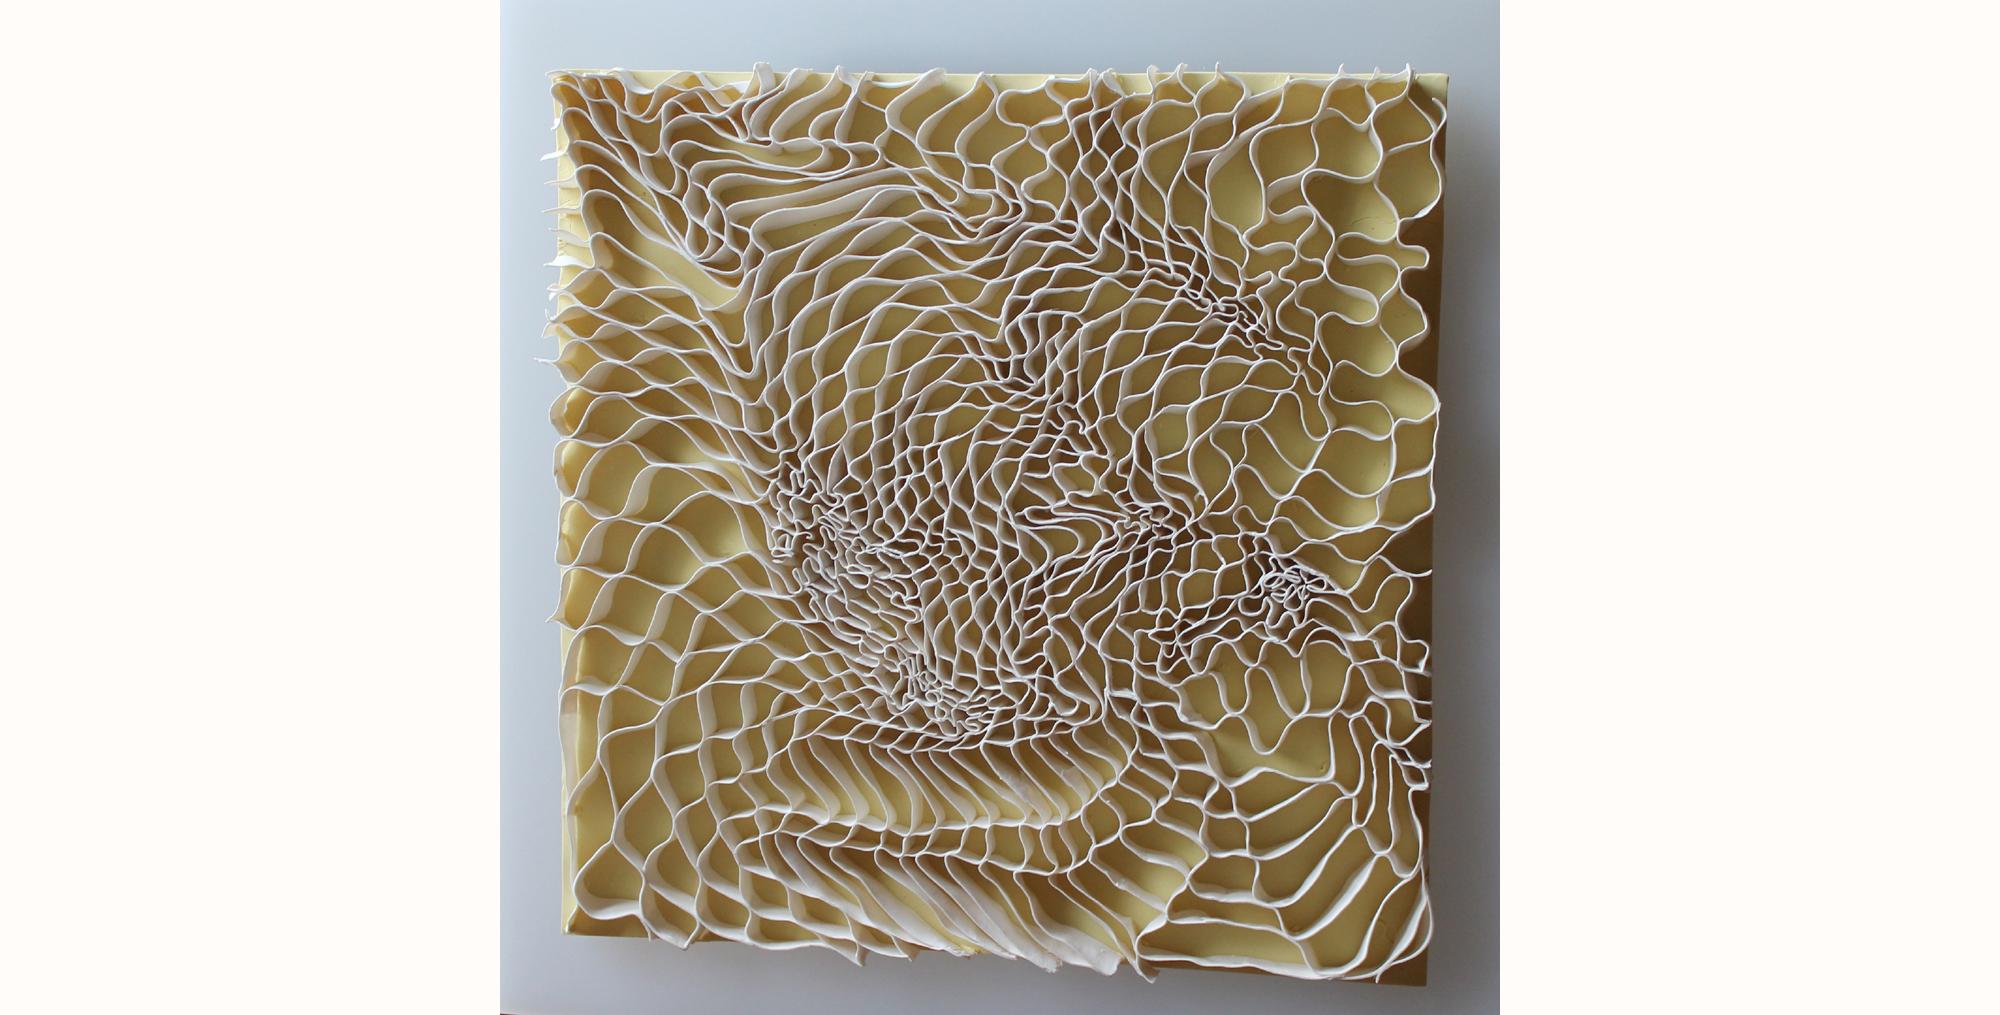 a5_ceramics_manufactured_fenellaelms_mdby_mdba